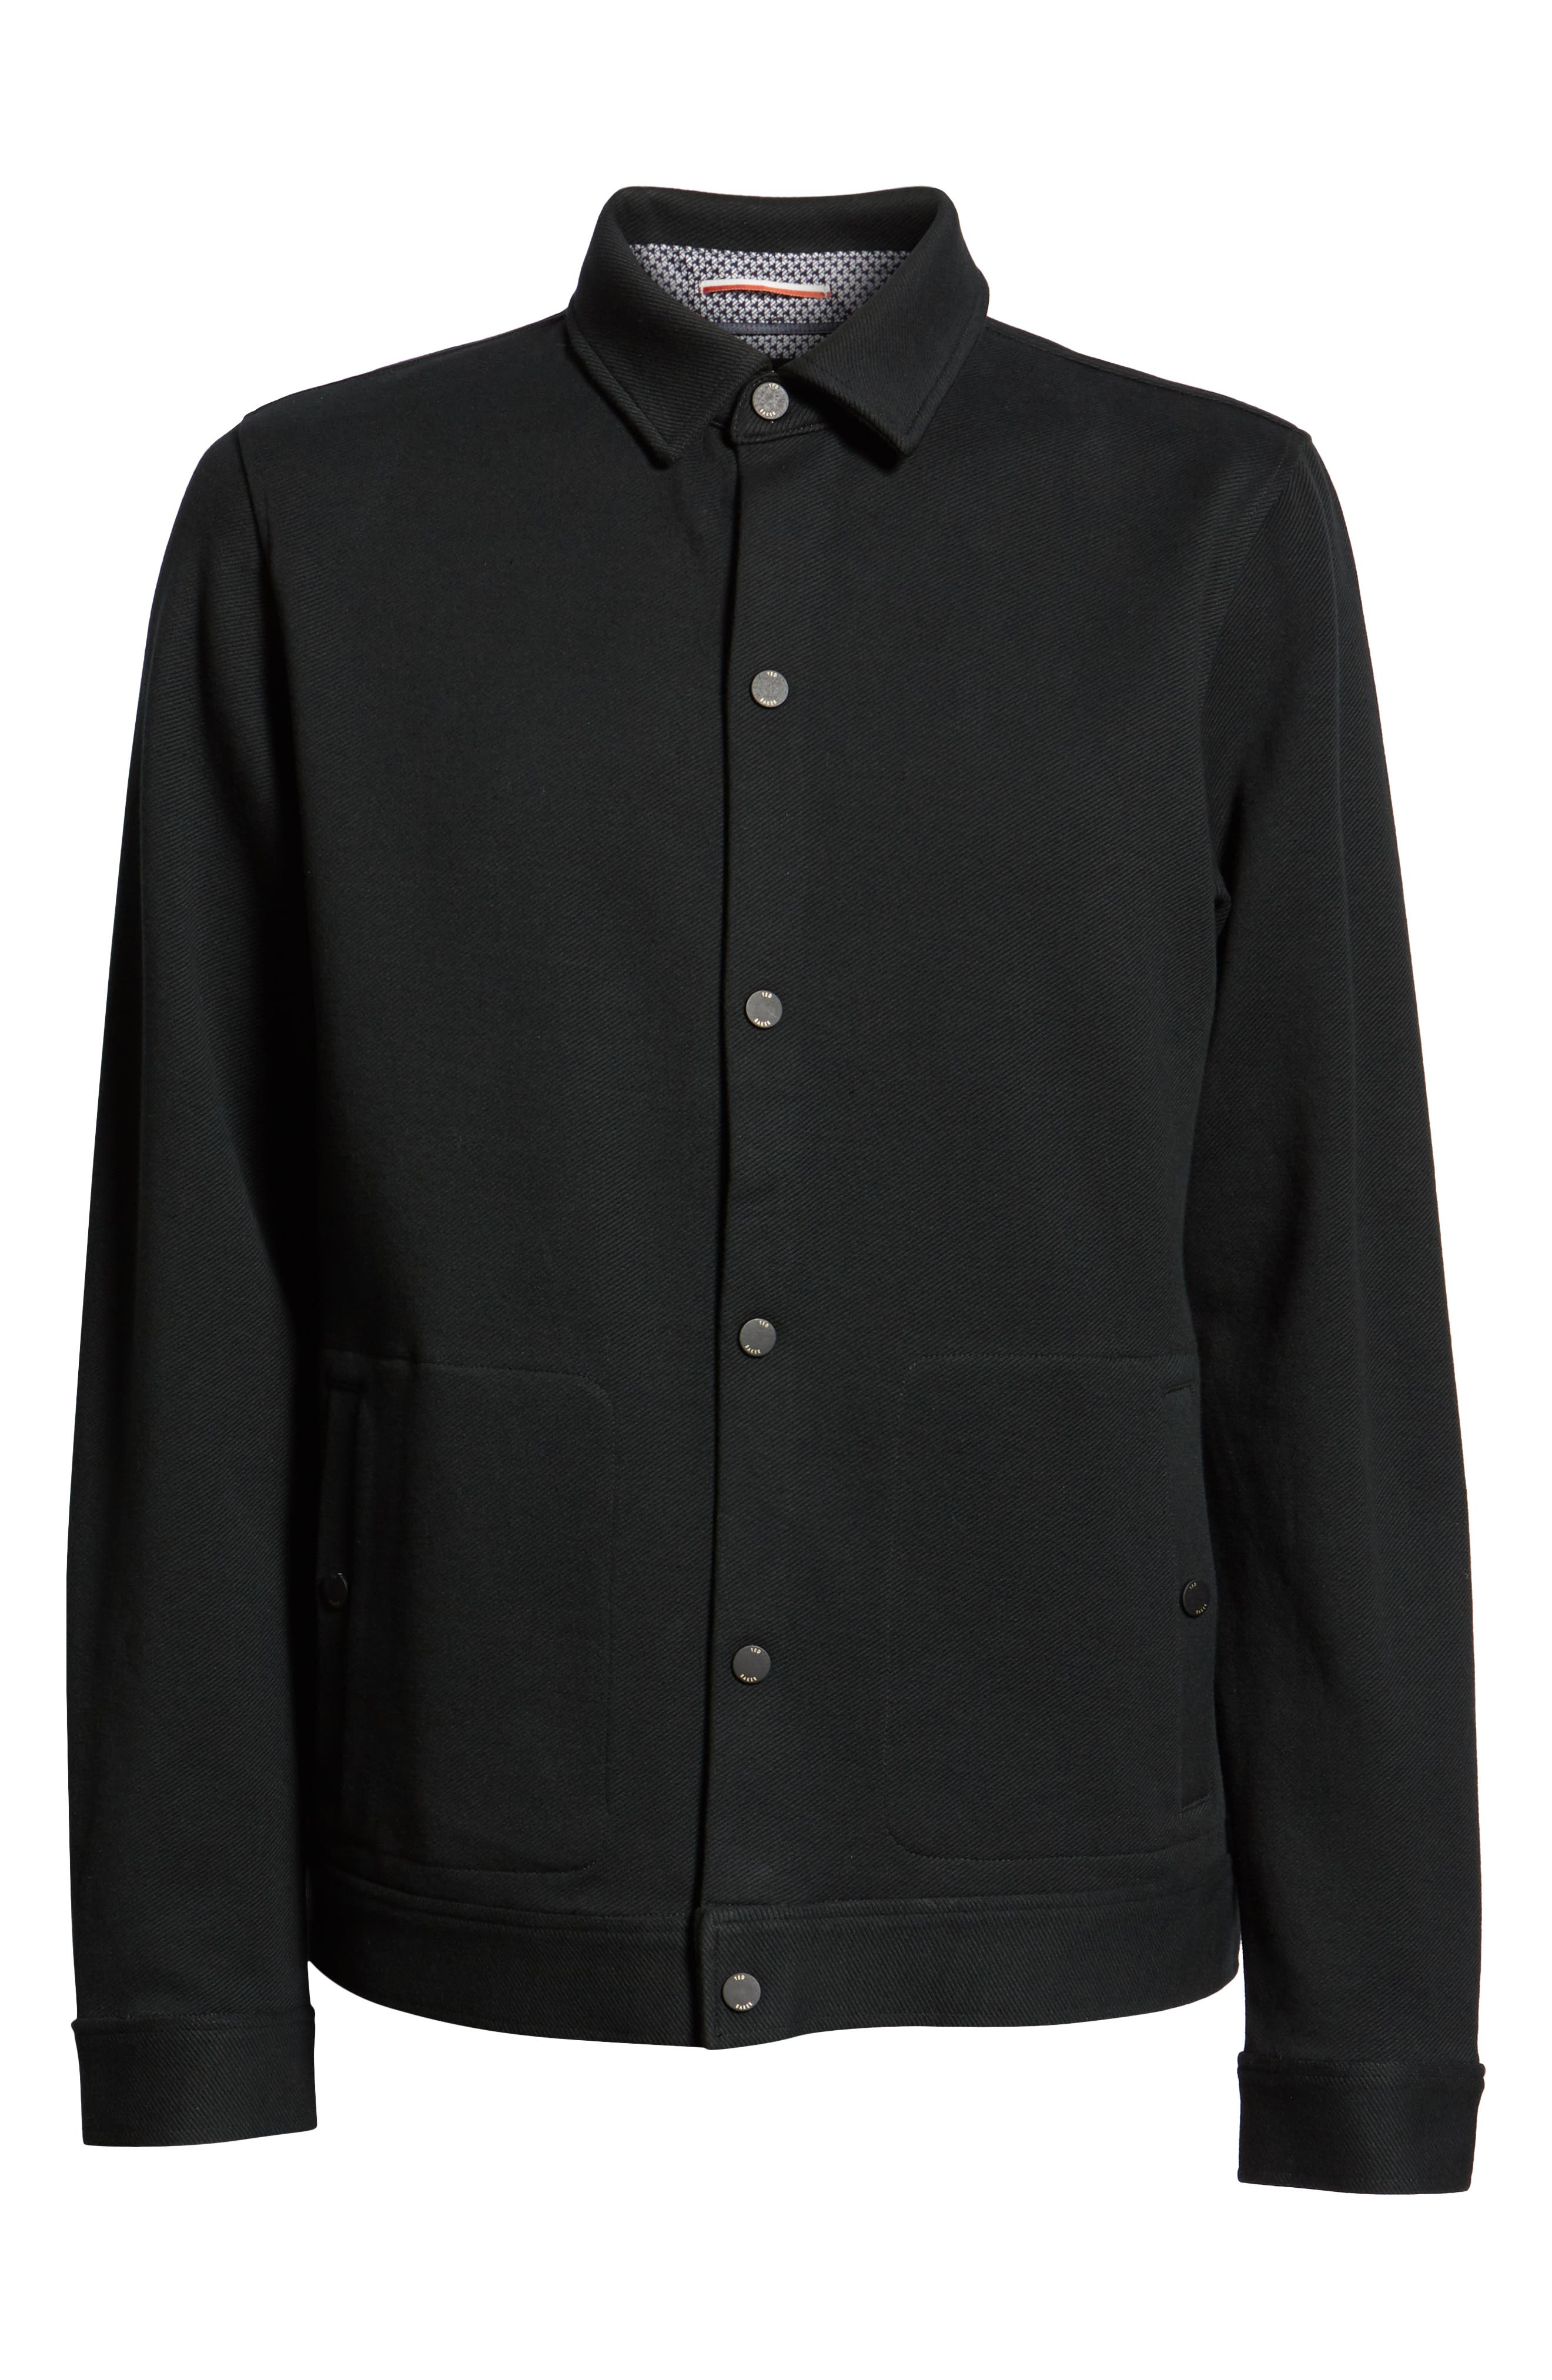 Danett Tall Twill Jacket,                             Alternate thumbnail 5, color,                             BLACK